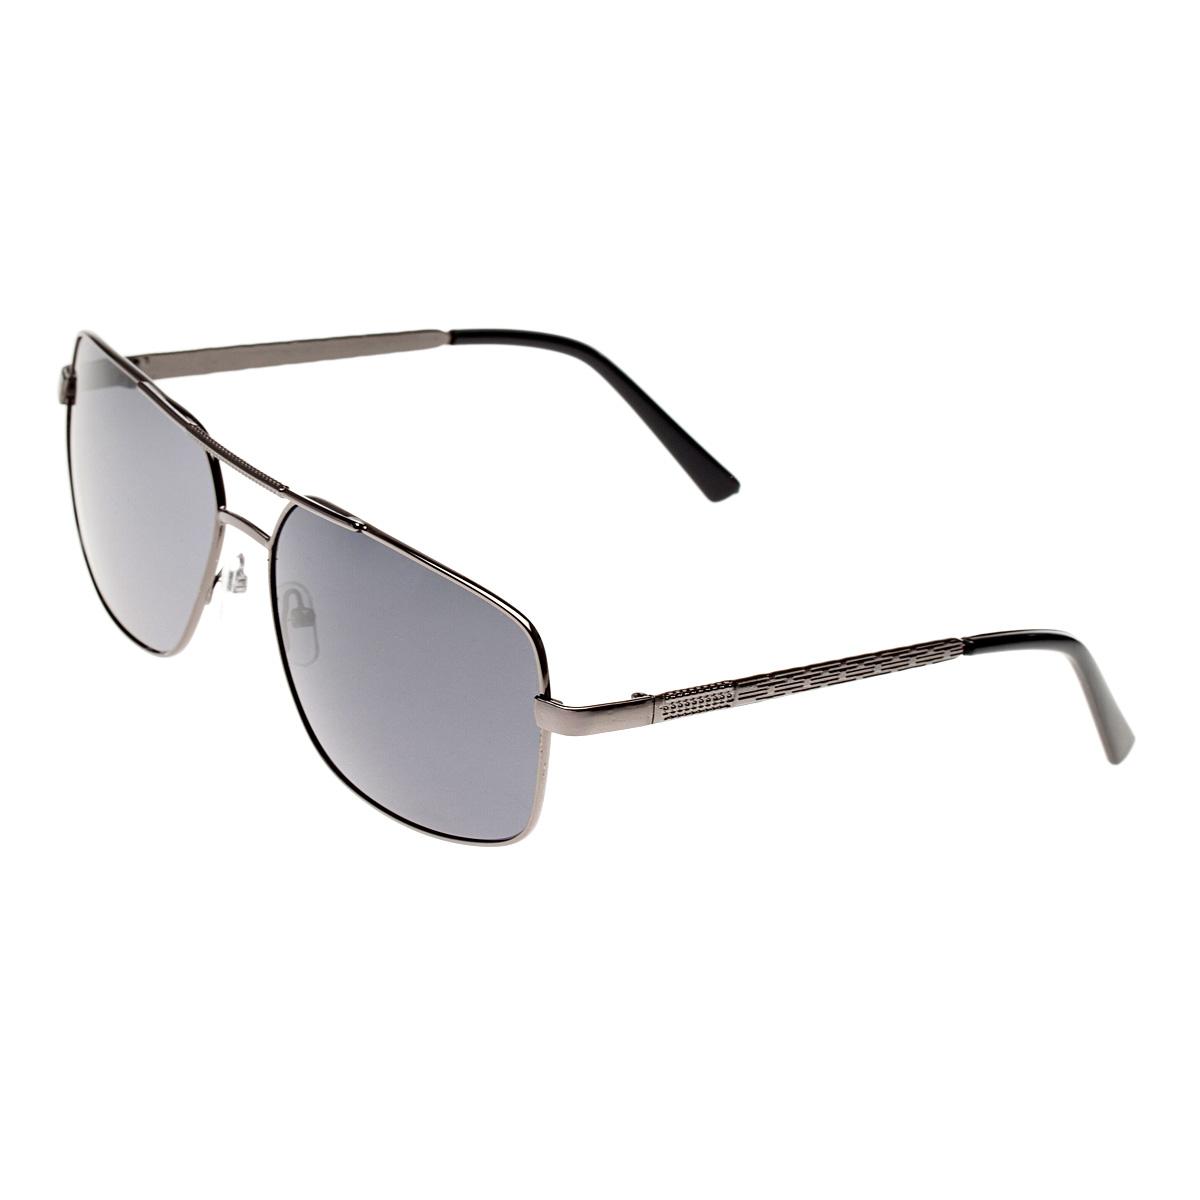 Фото - Очки солнцезащитные Sevenext, 23032-54 очки солнцезащитные sevenext 23032 28